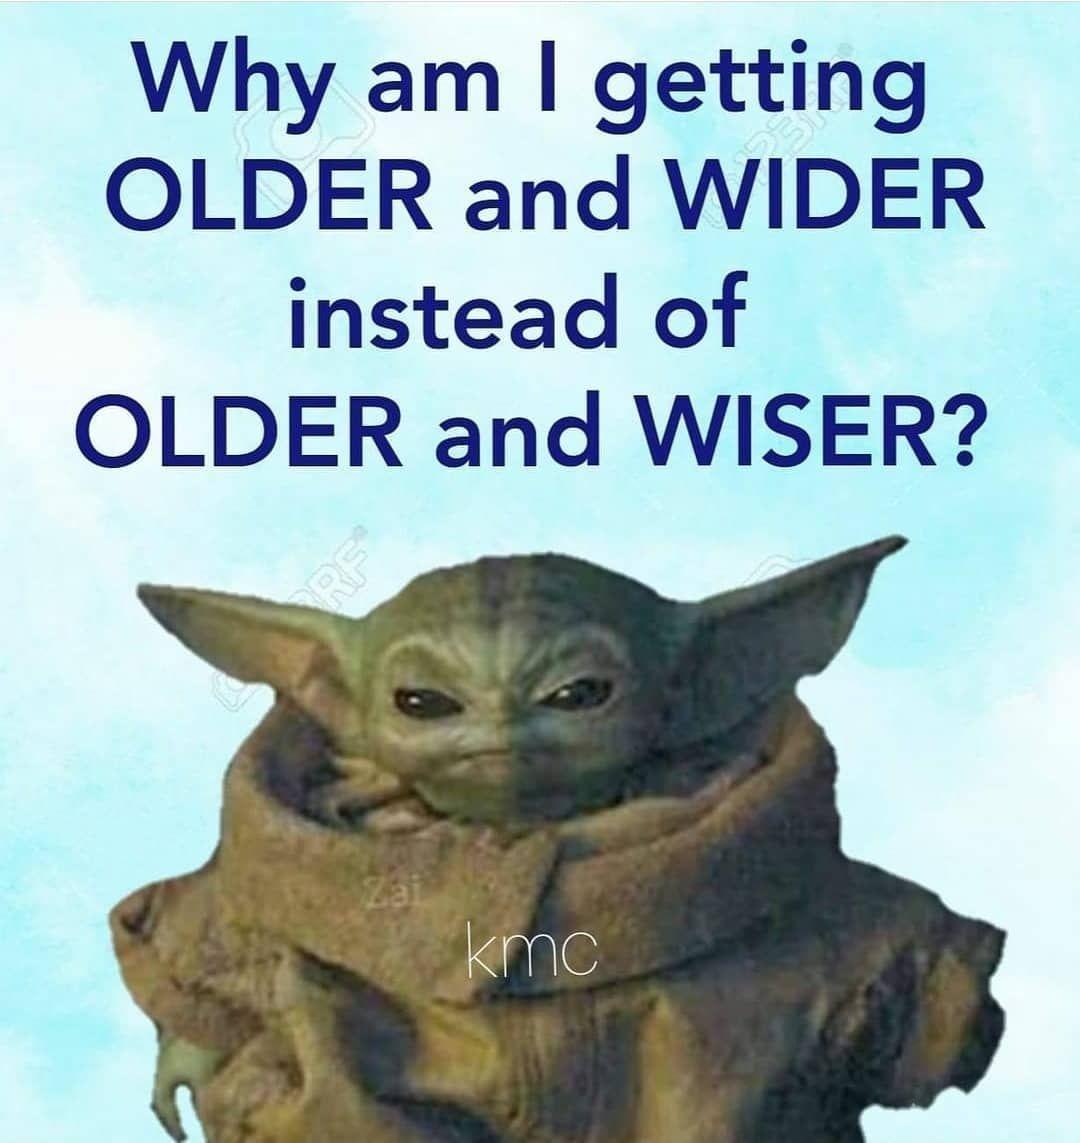 Mi Piace 1 861 Commenti 27 Baby Yoda Only Babyyoda Su Instagram Follow Only Babyyoda Tag Someone Yoda Funny Yoda Meme Star Wars Jokes